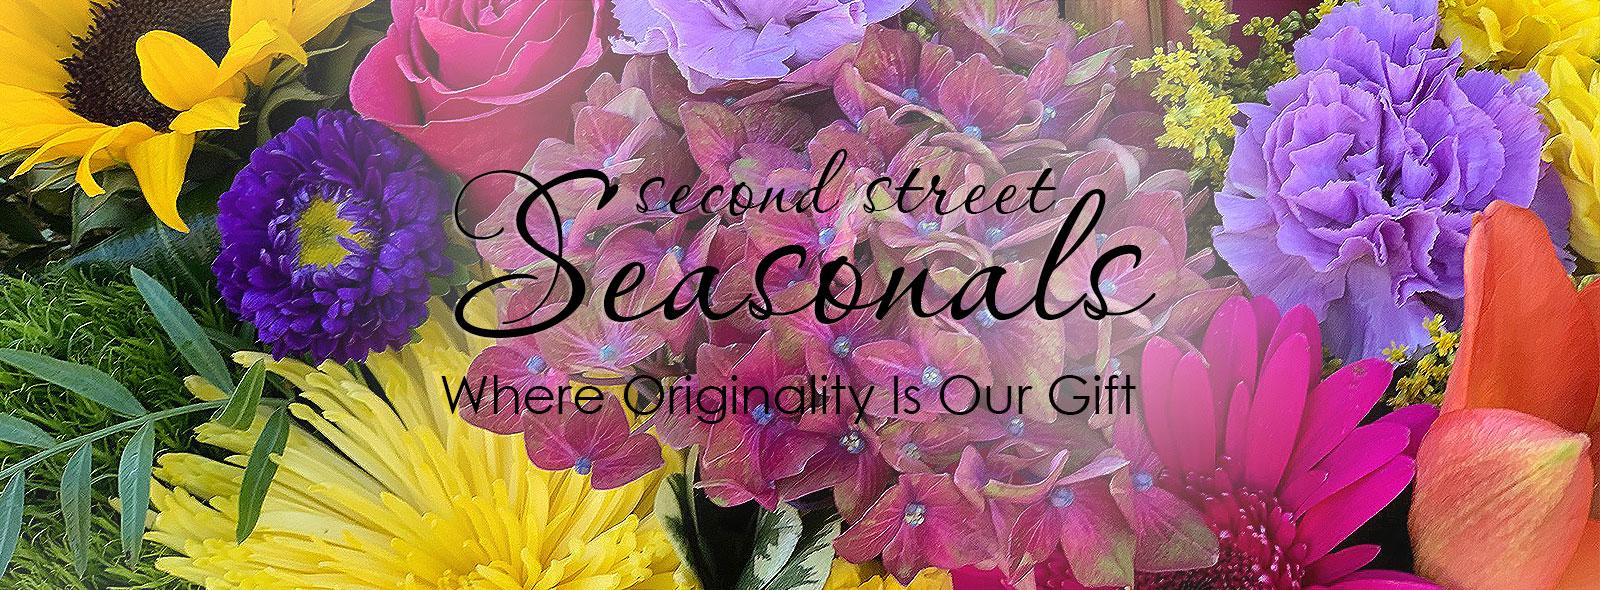 Second Street Seasonals